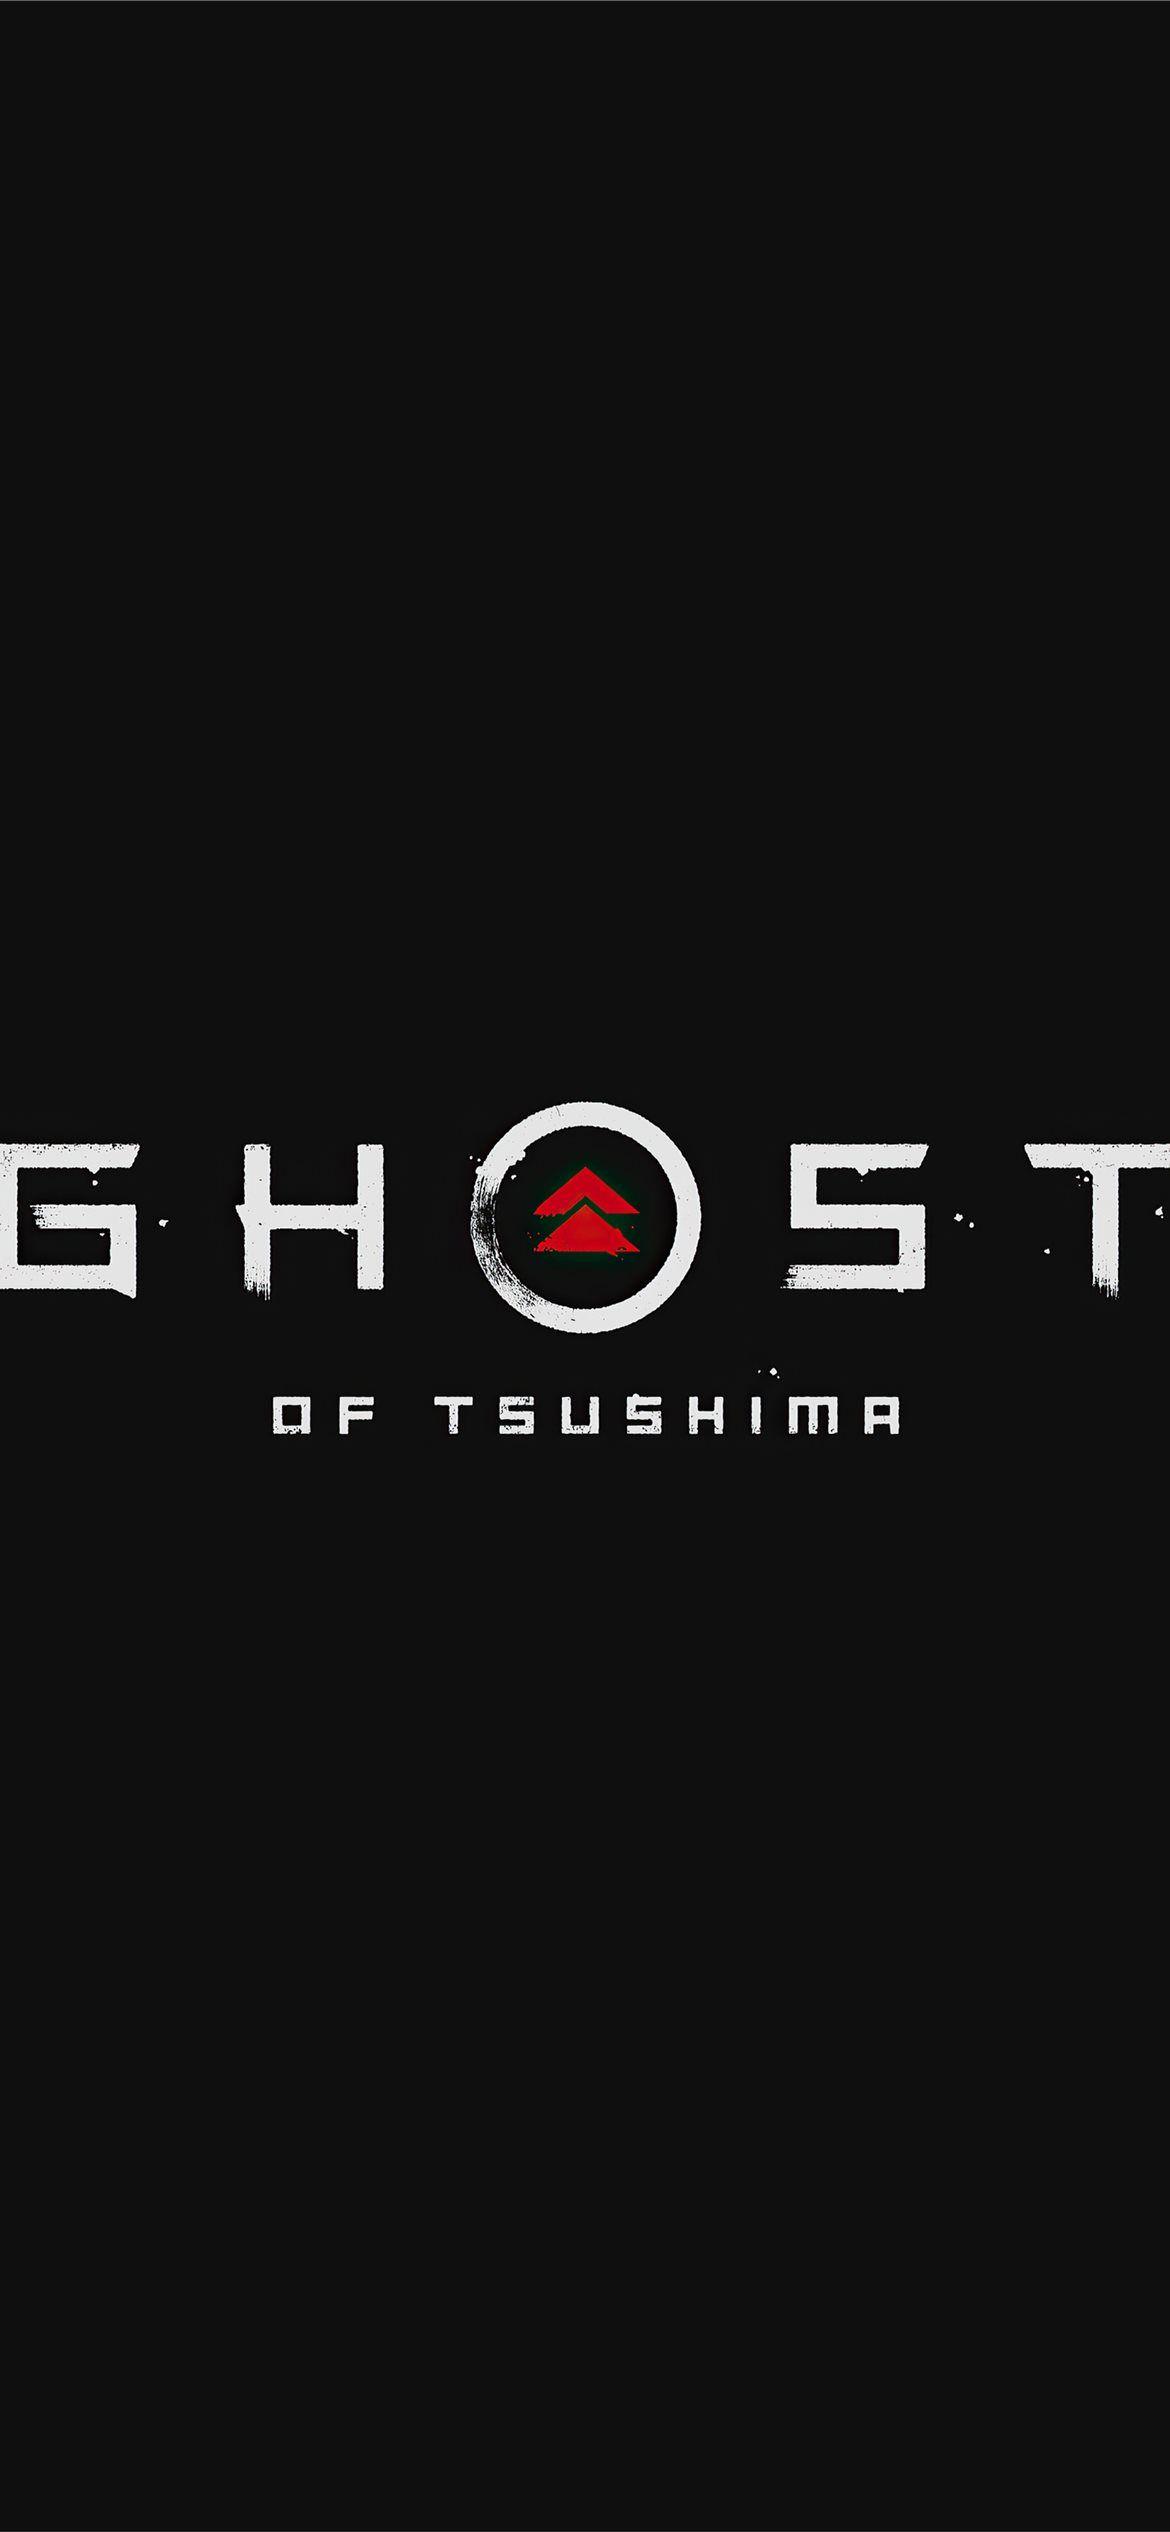 Ghost Of Tsushima Logo 4k Ghostoftsushima 2020games Games 4k Logo Dark Ghost Of Tsushima Tsushima Ghost Iphone 4k ghost of tsushima logo